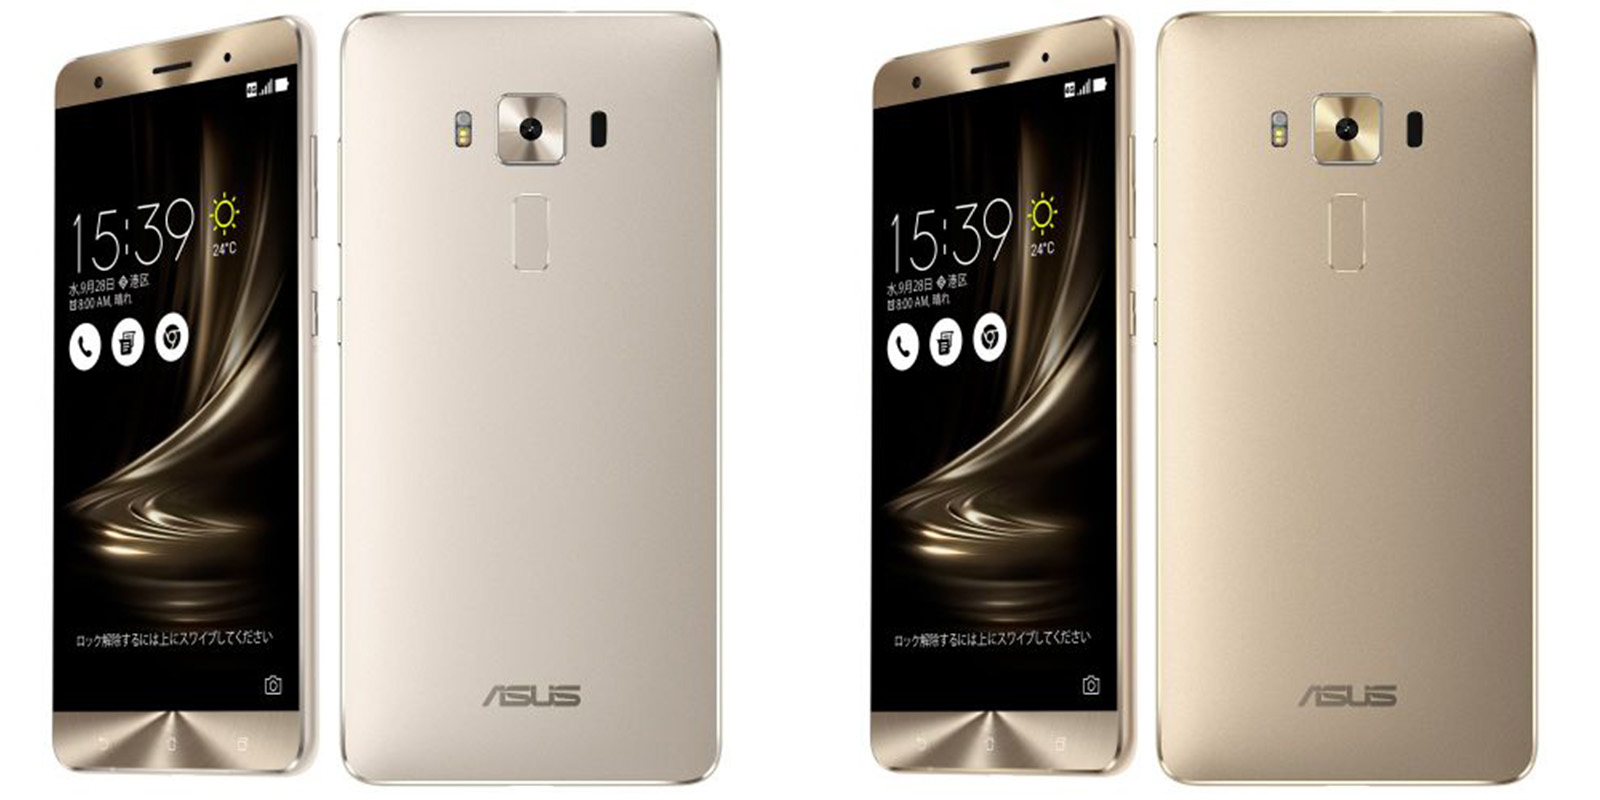 ASUS ZenFone ZS570KL